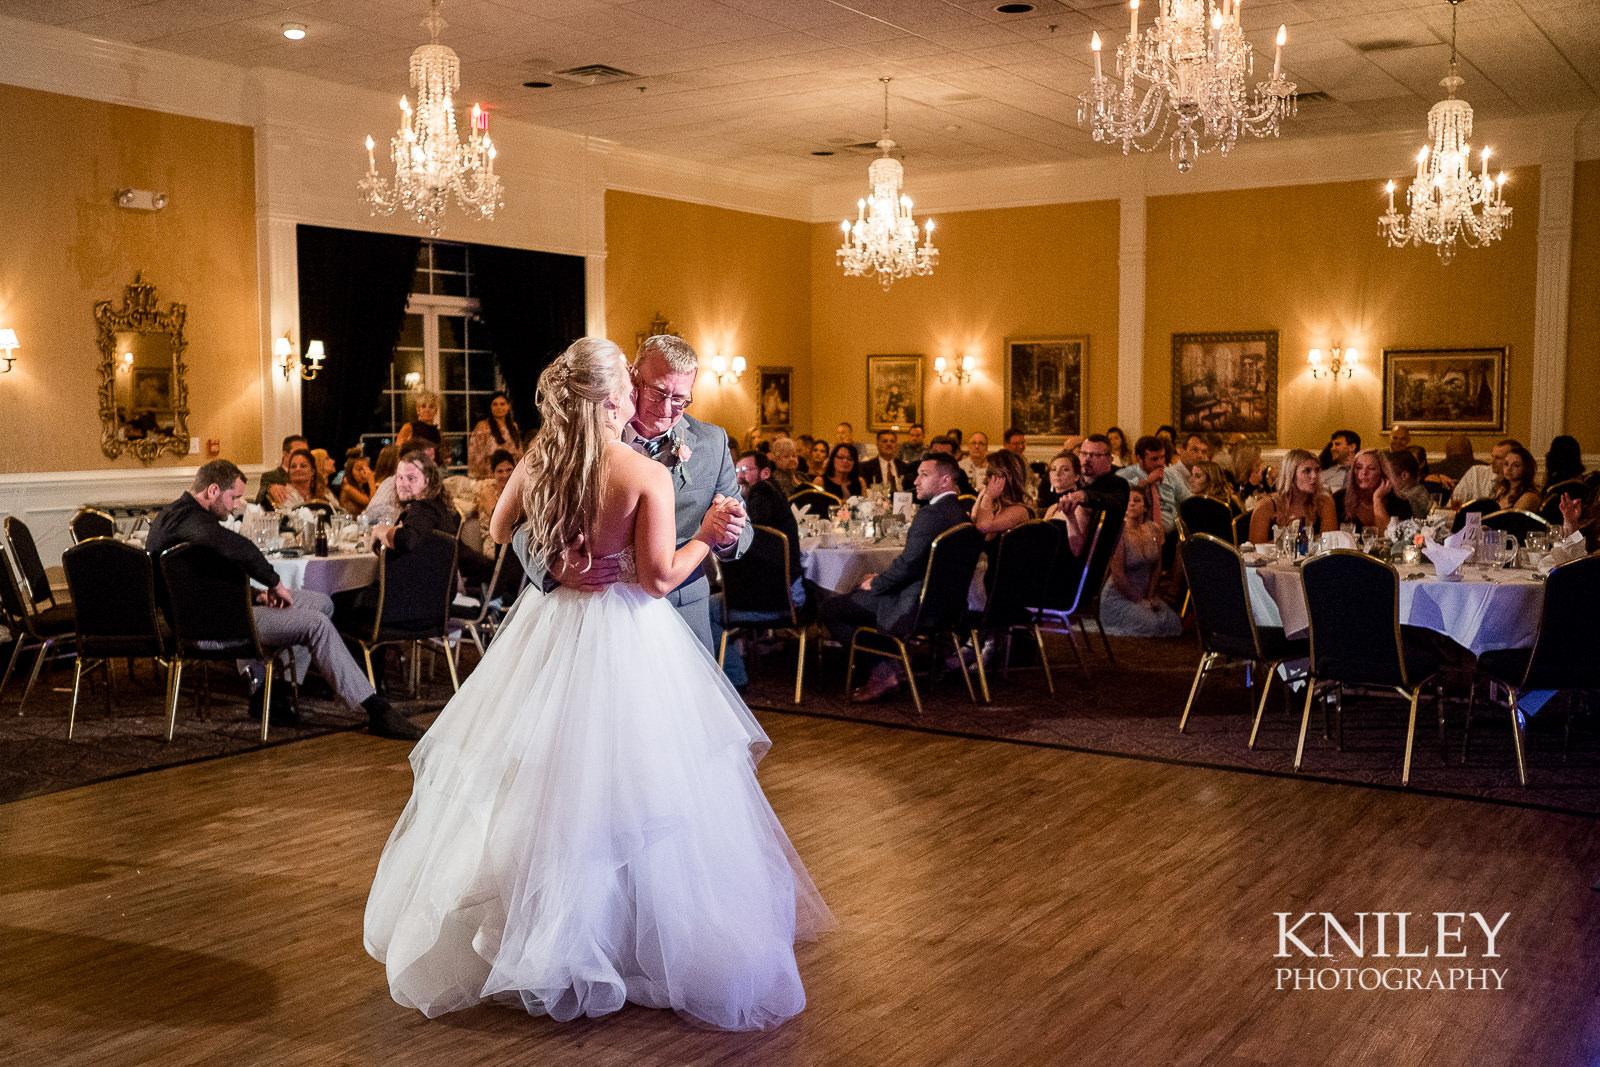 107 - Buffalo NY wedding pictures - Sean Patrick Restaurant Wedding Reception - Getzville - XT2B9561.jpg